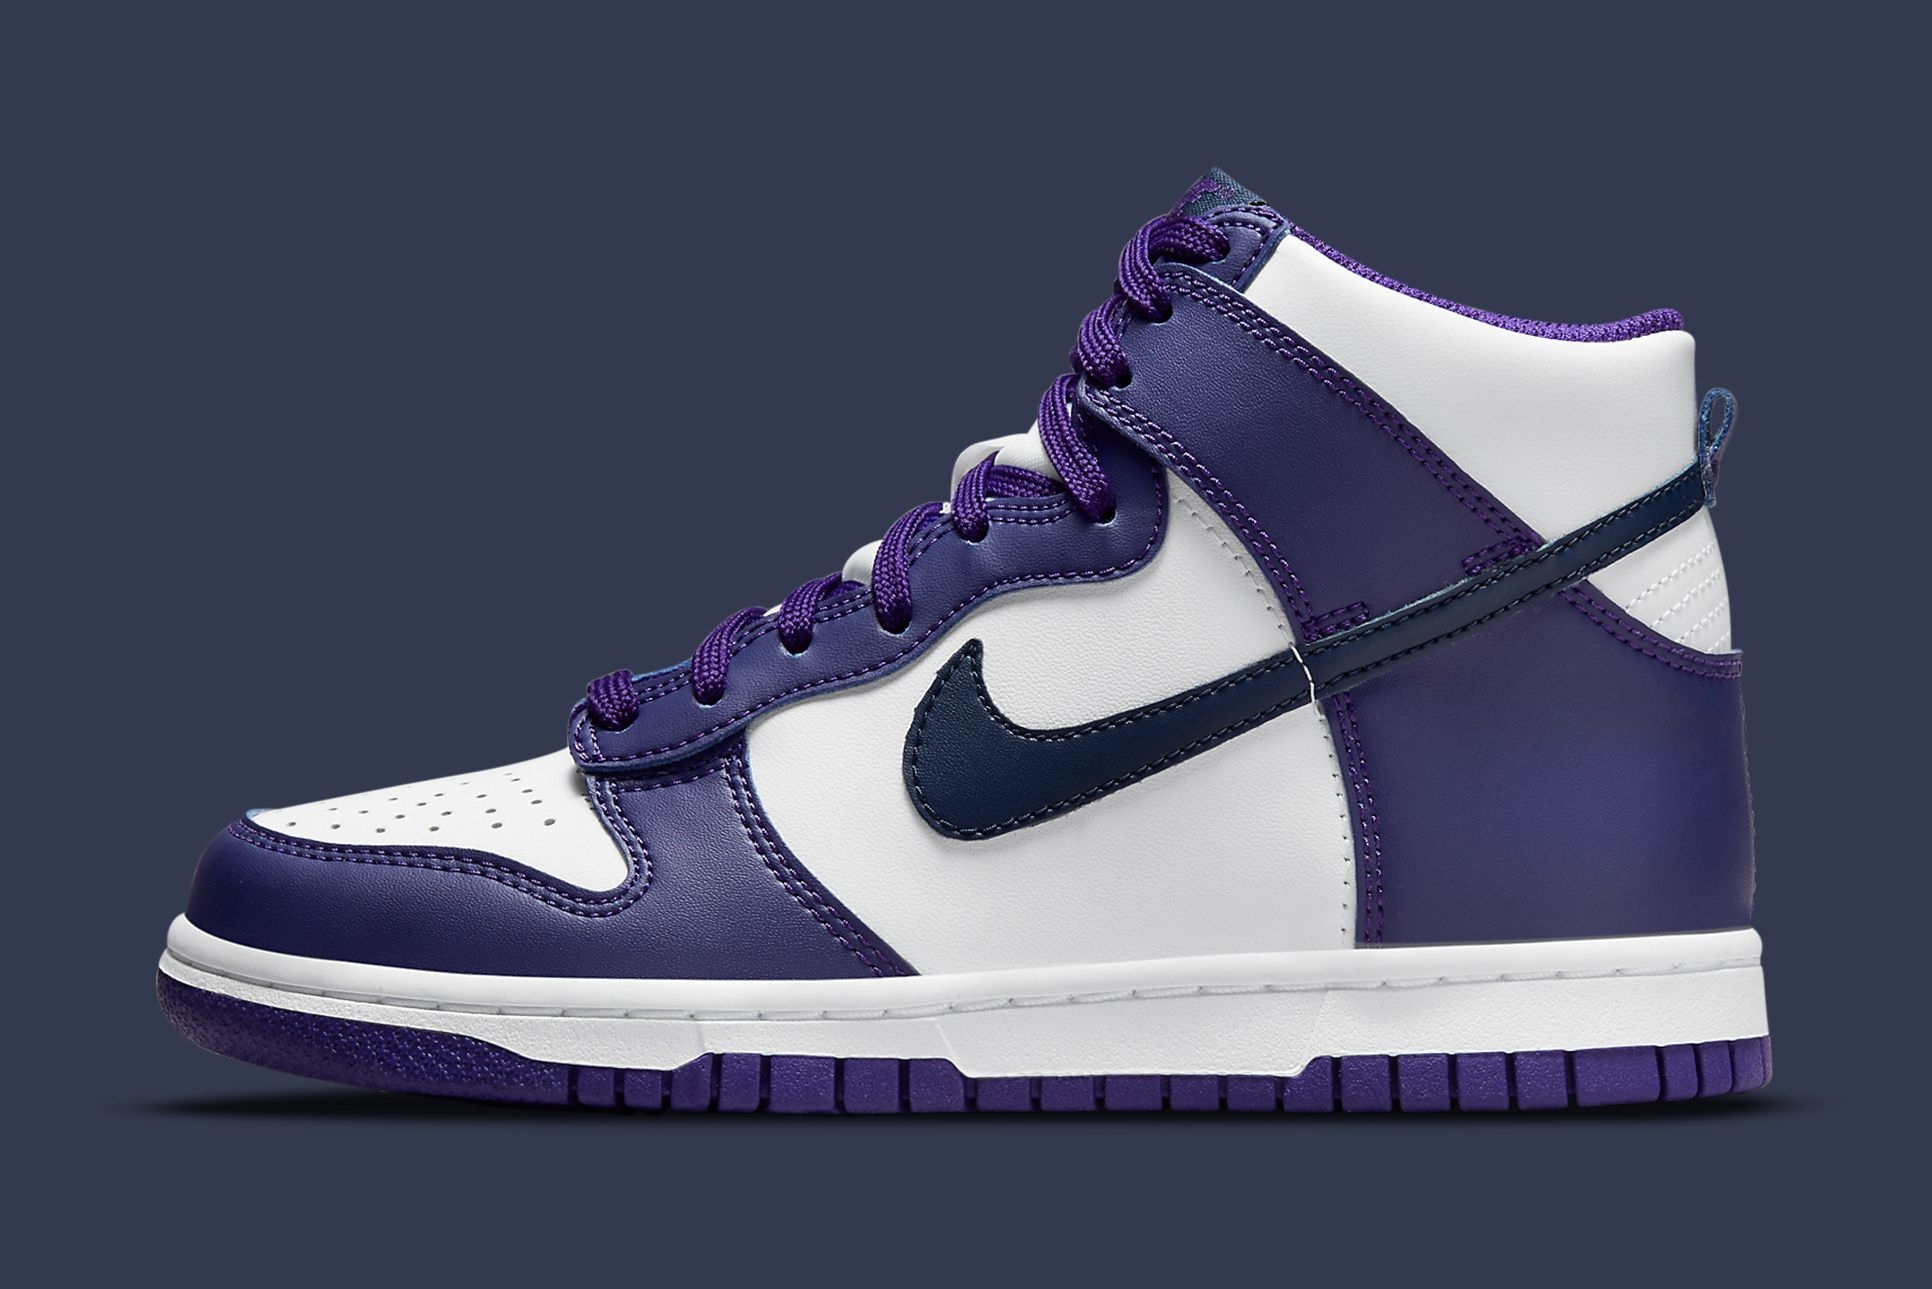 Nike Dunk High Court Purple/Navy